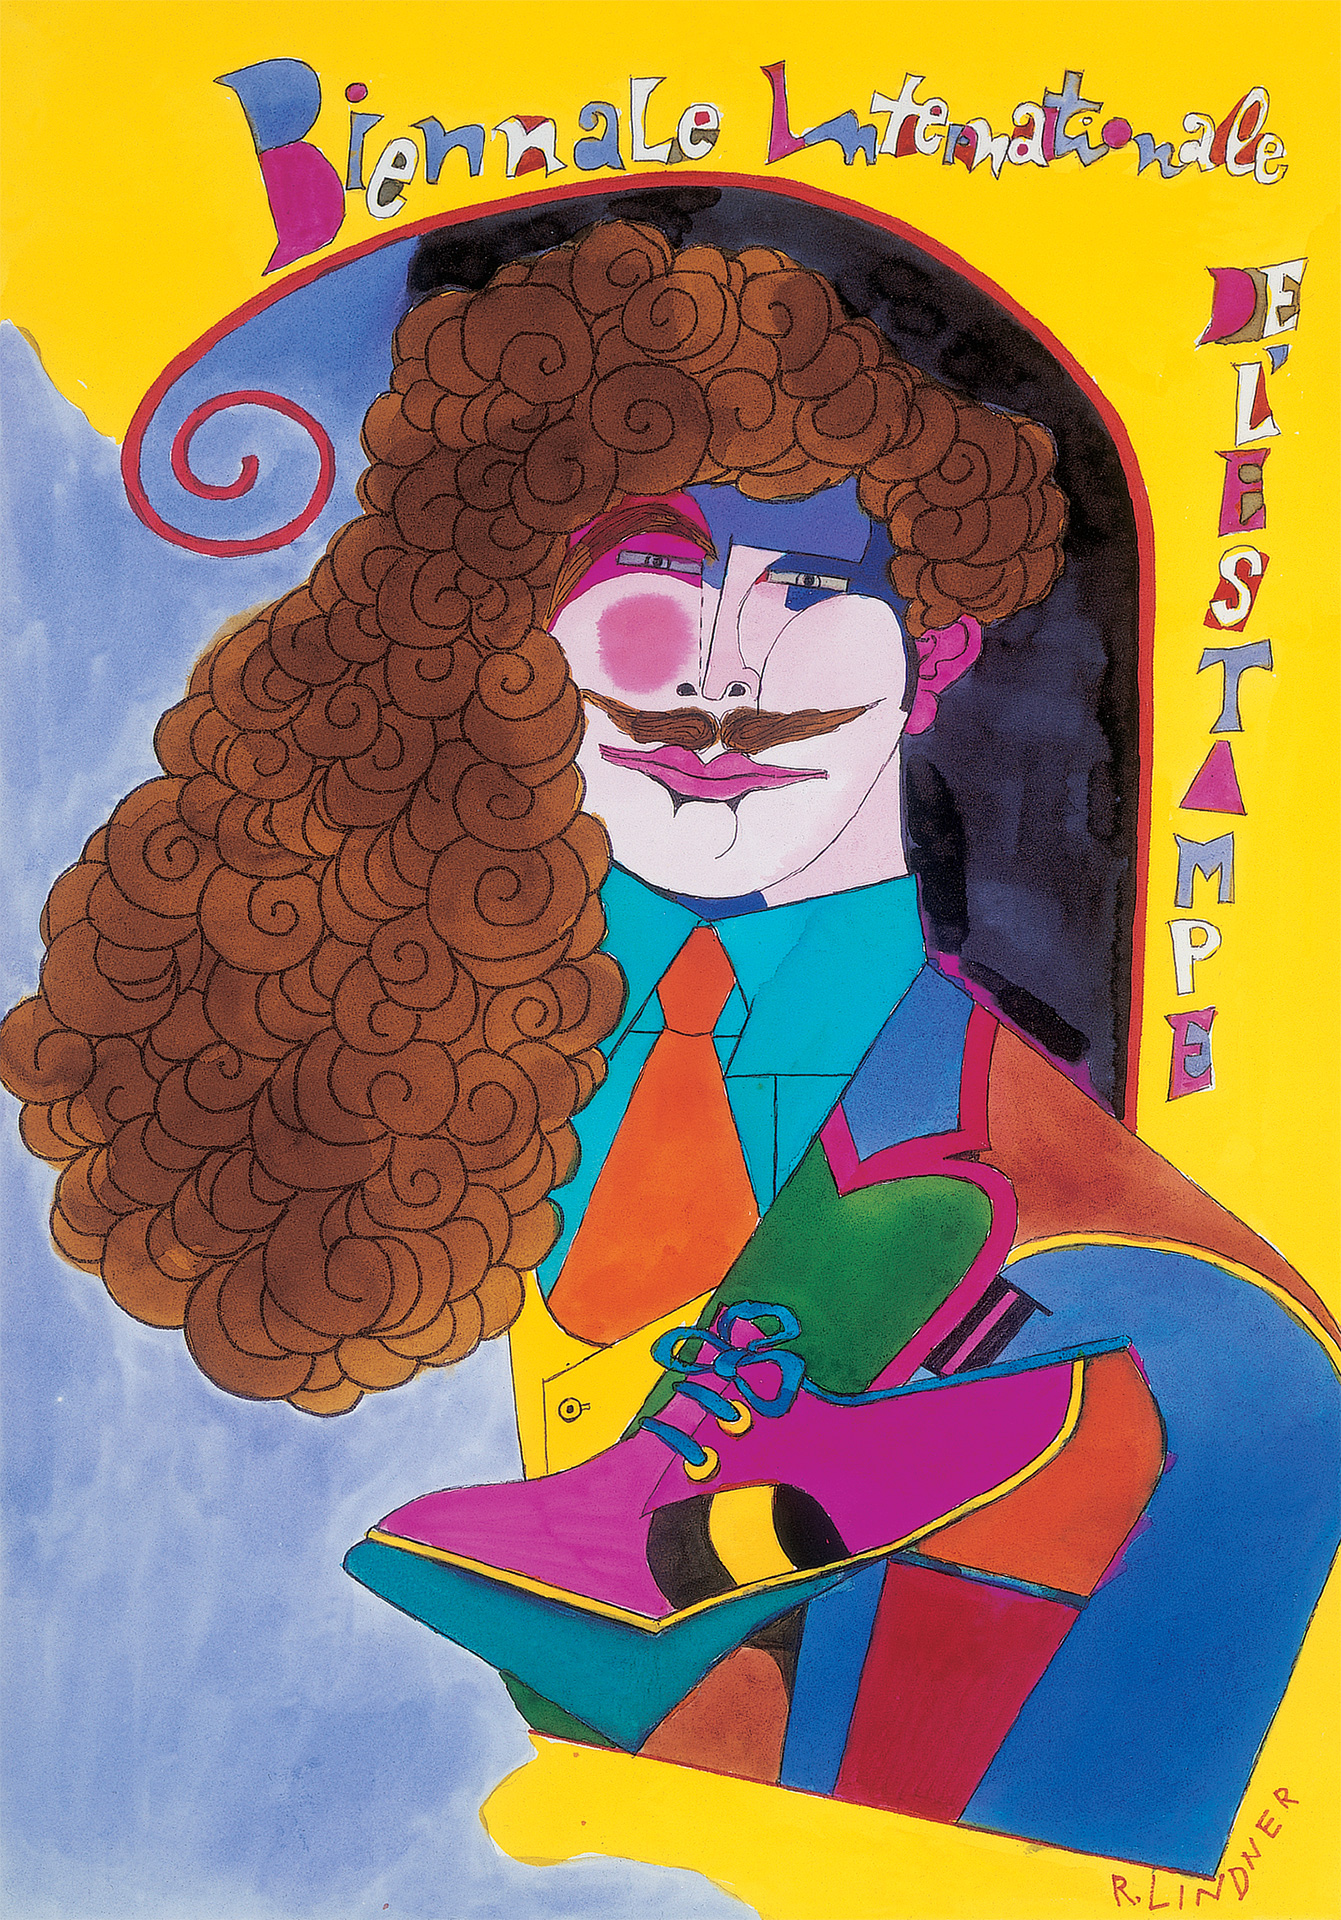 Biennale Internationale de L'Estampe, 1972 02 grand format